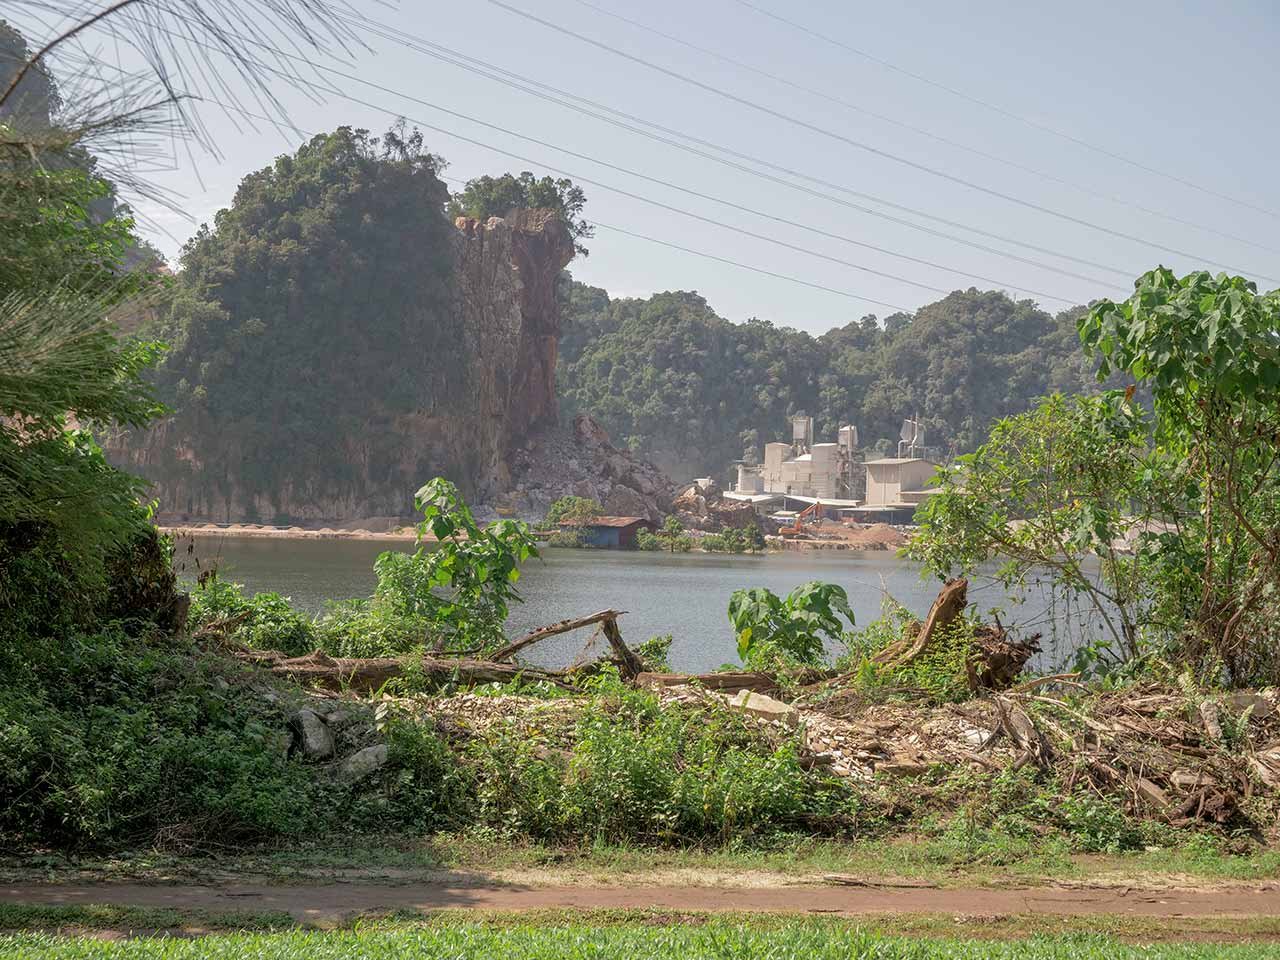 Baustelle hinter dem Park vom Kek Lok Tong Tempel in Ipoh